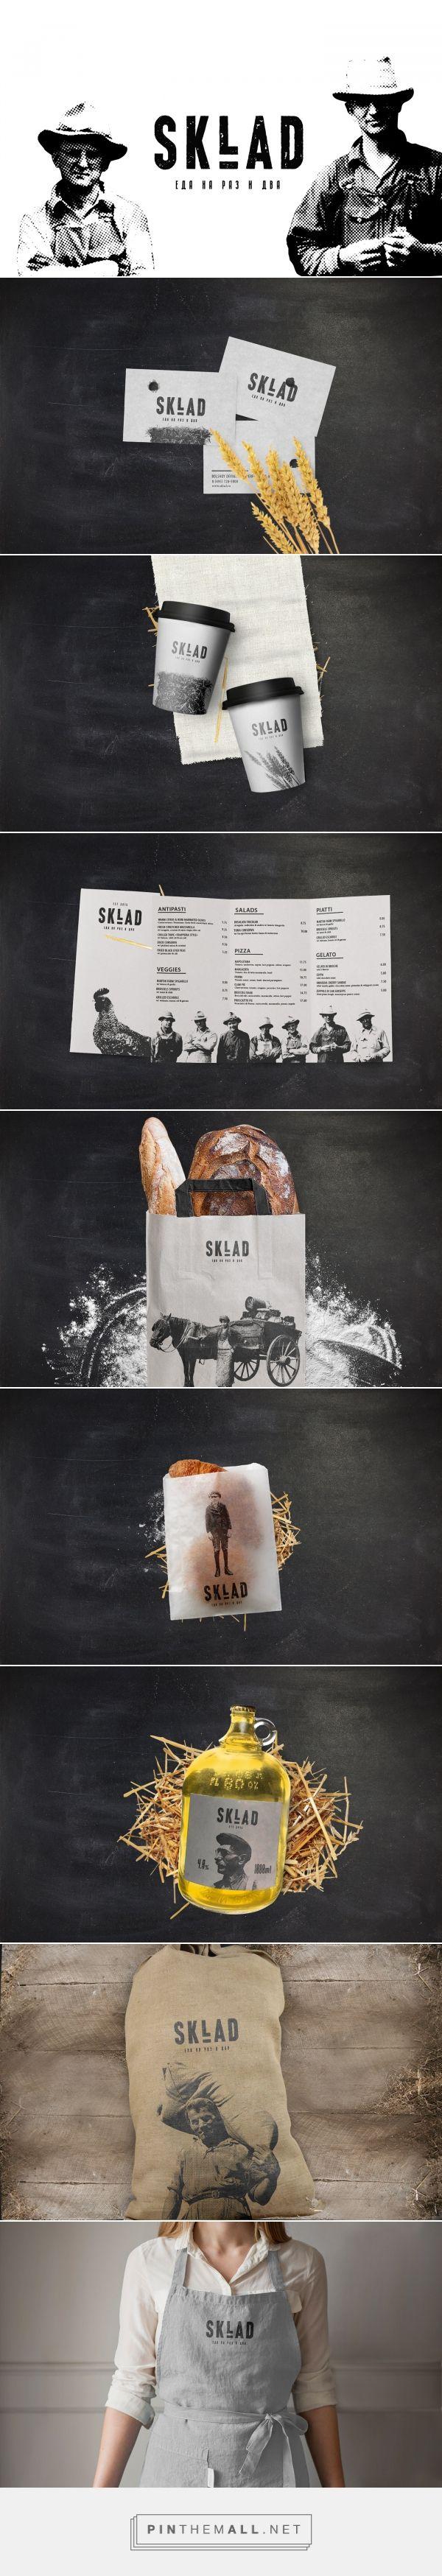 Sklad Restaurant Branding by Stepan Solodkov | Fivestar Branding Agency – Design and Branding Agency & Curated Inspiration Gallery